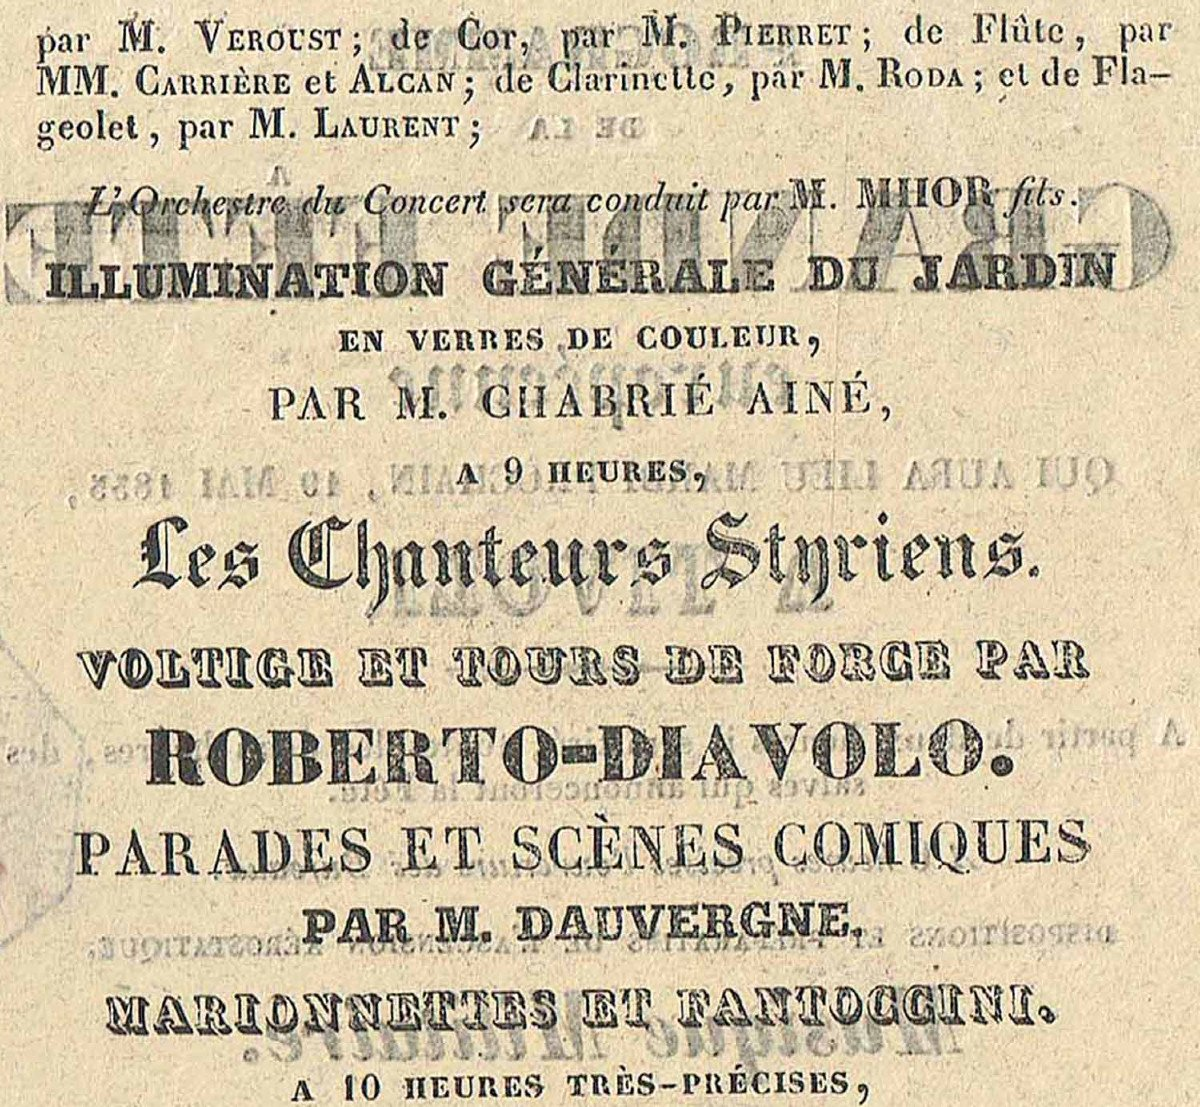 Programme FÊte Tivoli 1835  -photo-1